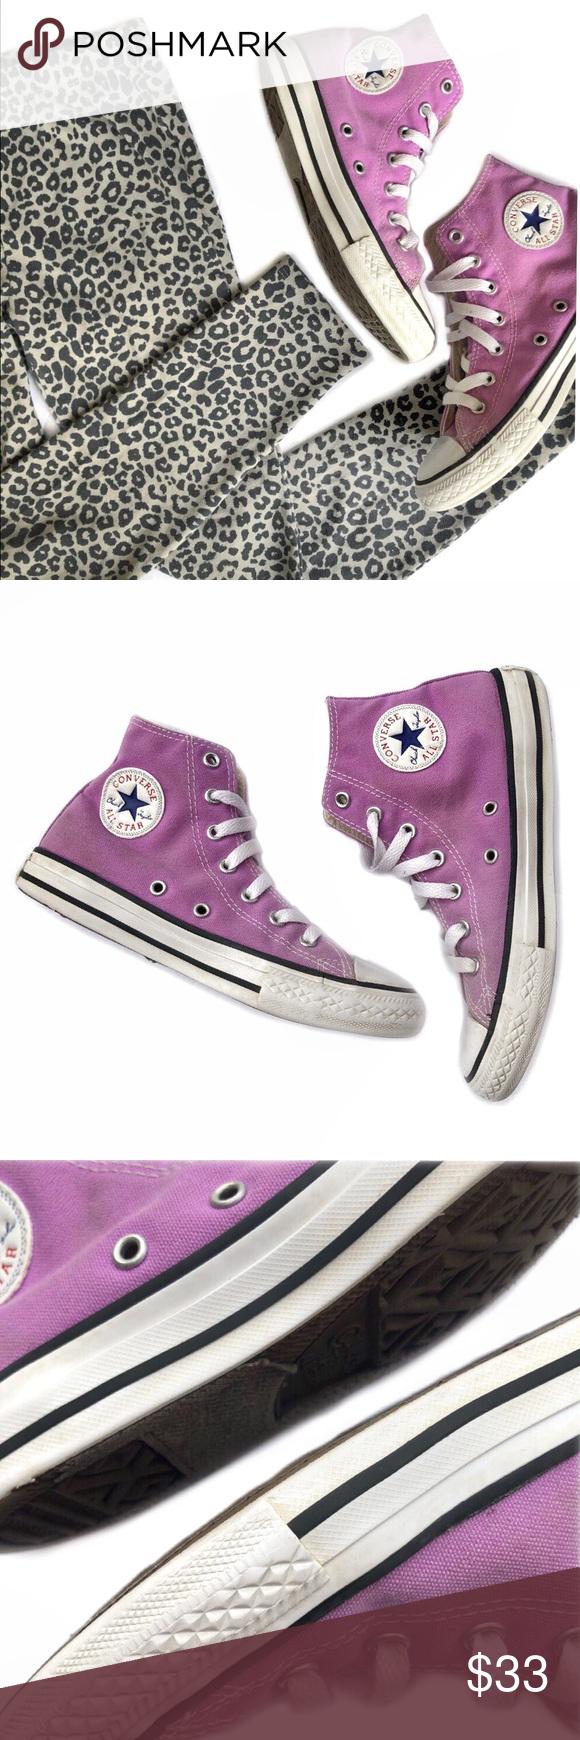 c6b3822bd3a1 Converse Chuck Taylor Fushia Purple High Tops Big kids Converse Chuck  Taylor All-Stars Classic